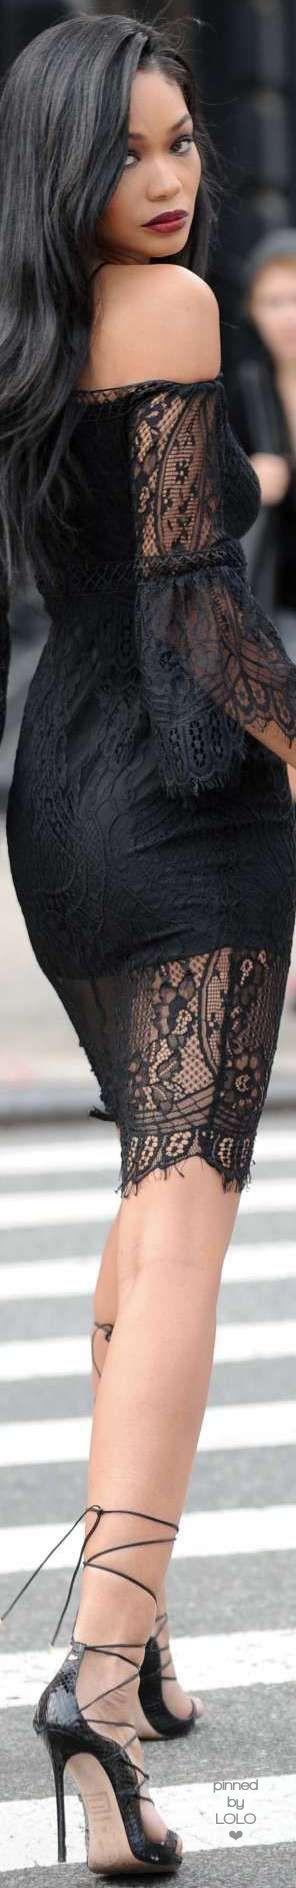 Chanel Iman Street Chic